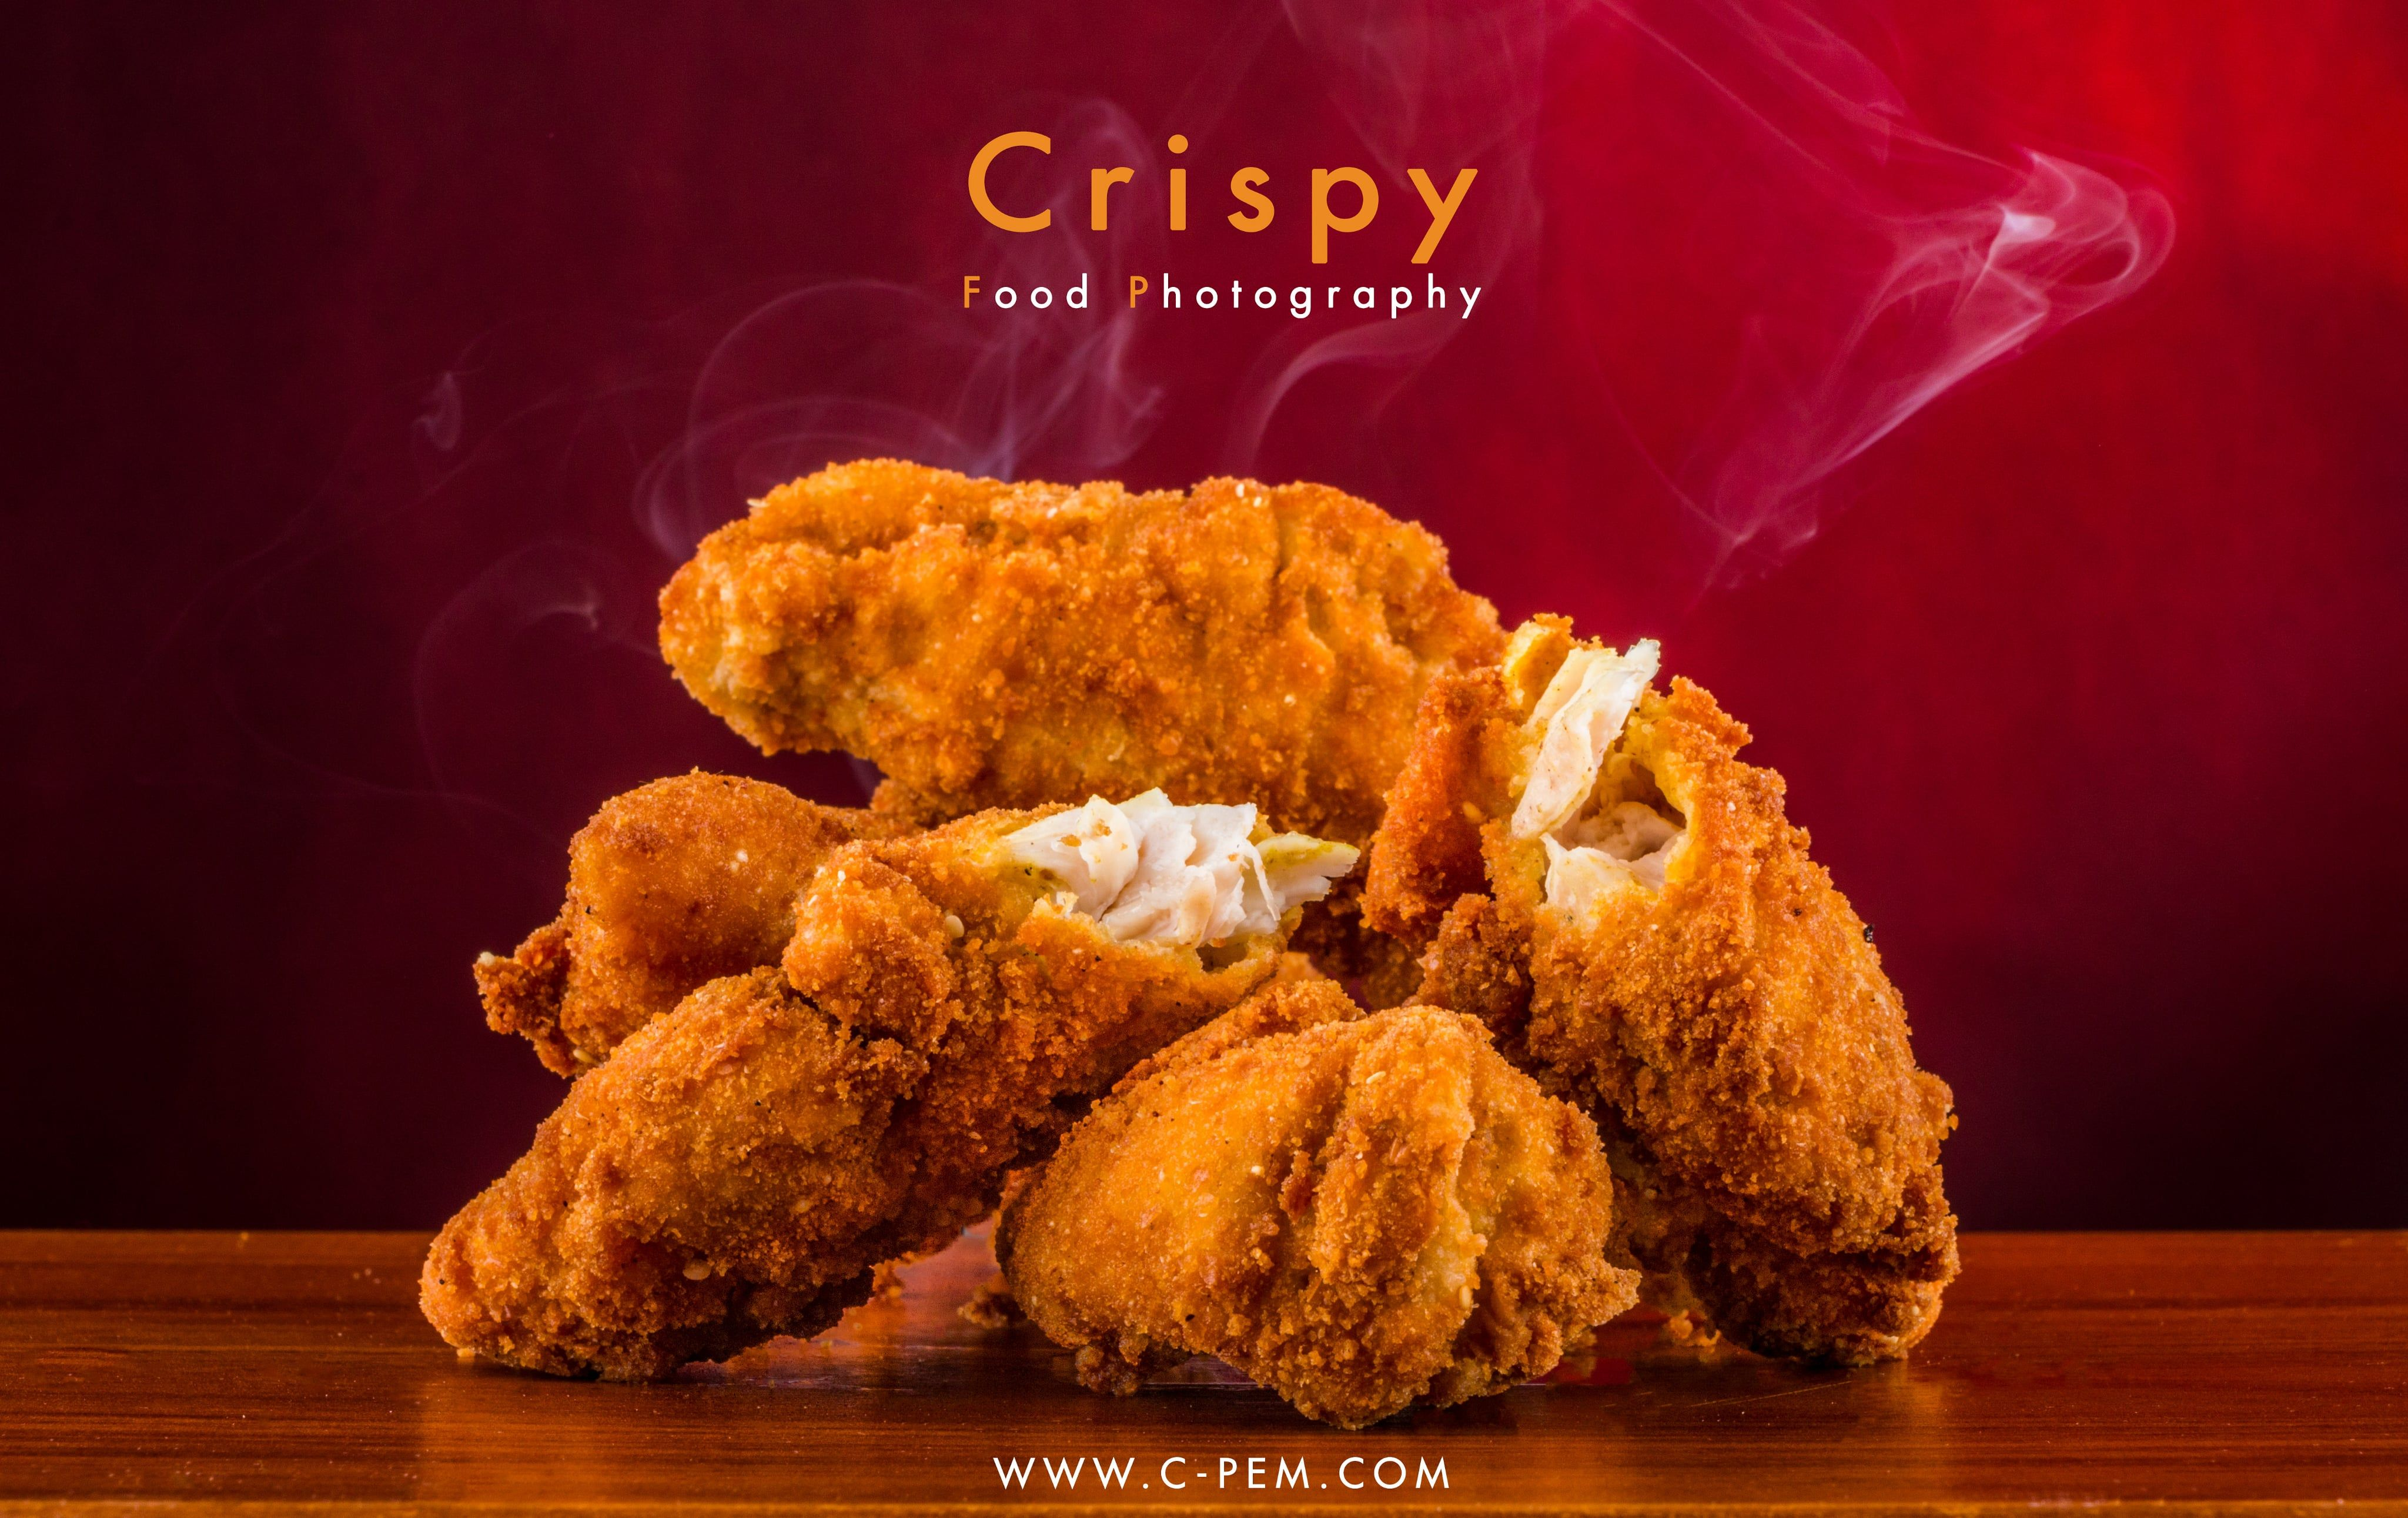 Food Photography Food Photography Food Photography